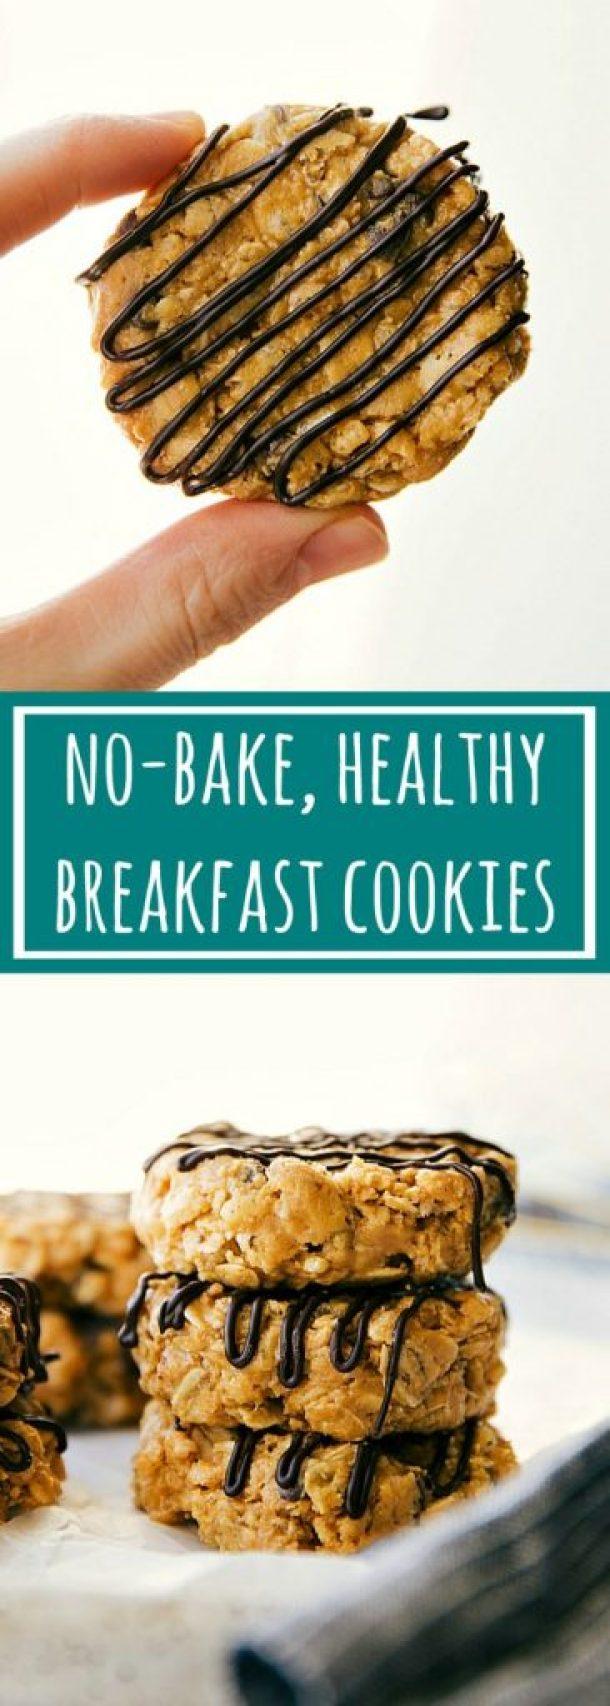 No Bake Cookies Recipes - No-Bake Healthy Breakfast Cookies Recipe via Chelseas Messy Apron